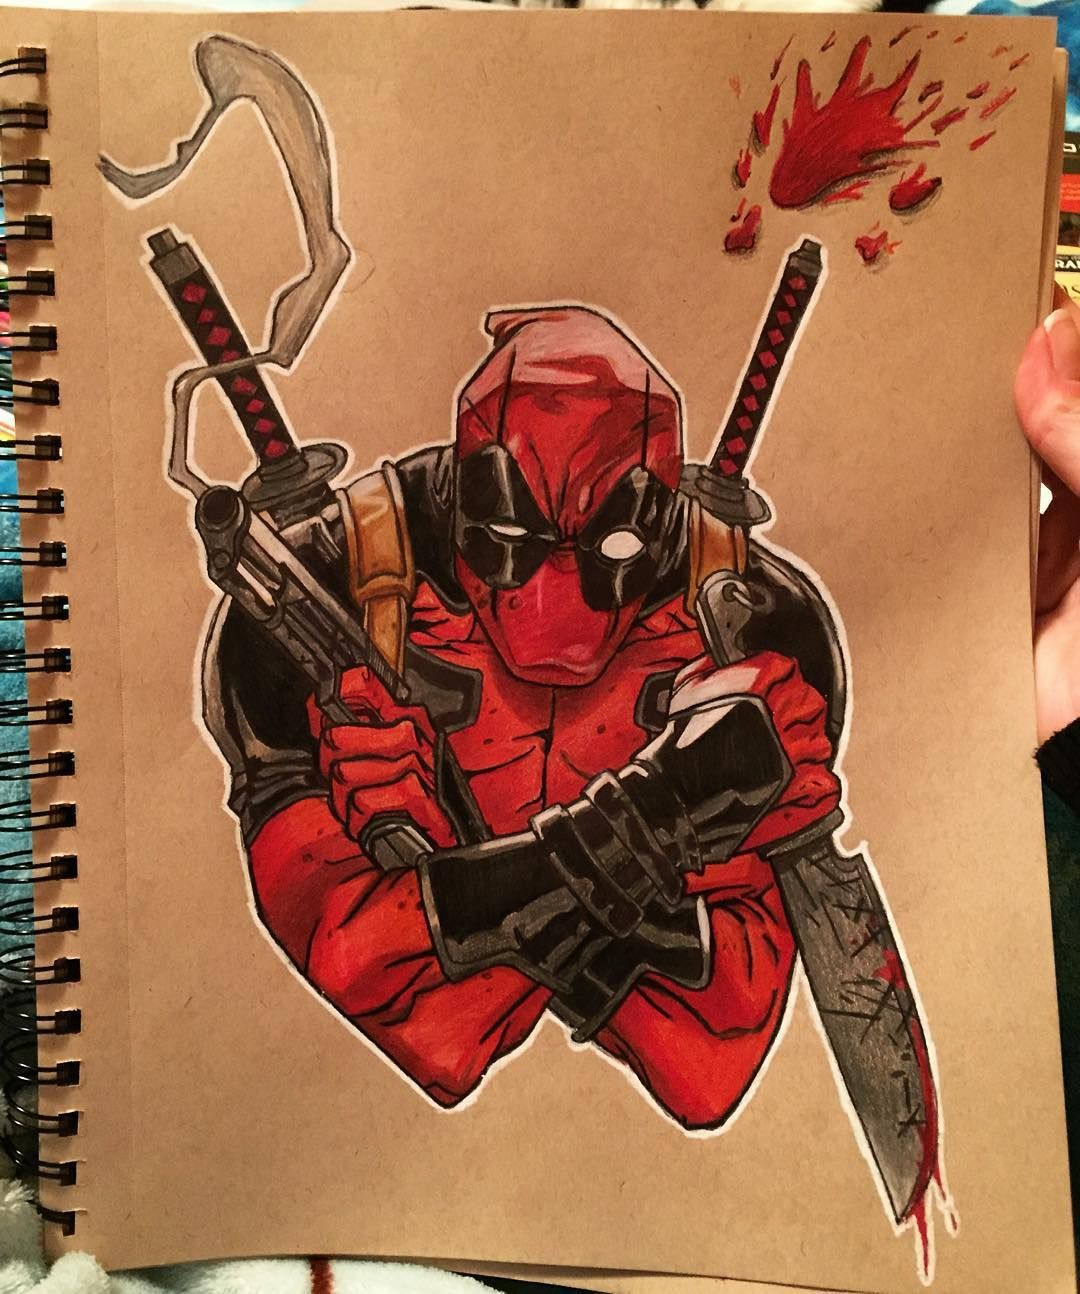 «He's done ☺️ #Deadpool #marvel #drawing #art #deadpoolart ...